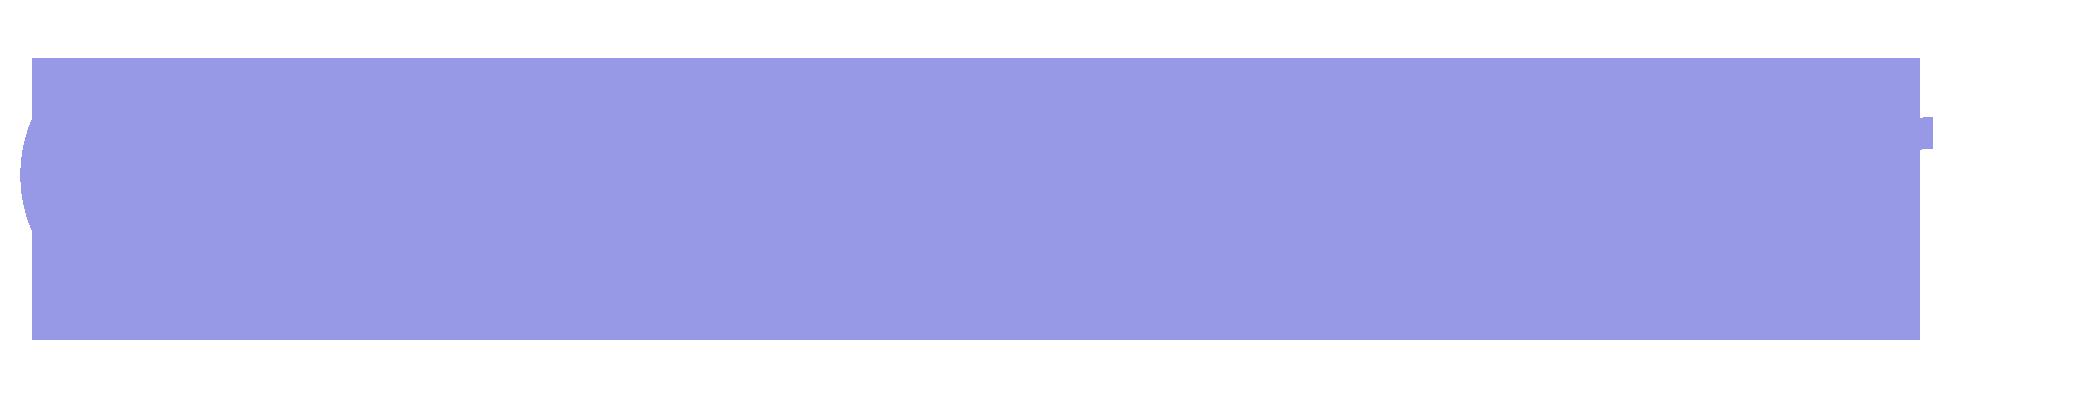 Jumbo Tiger